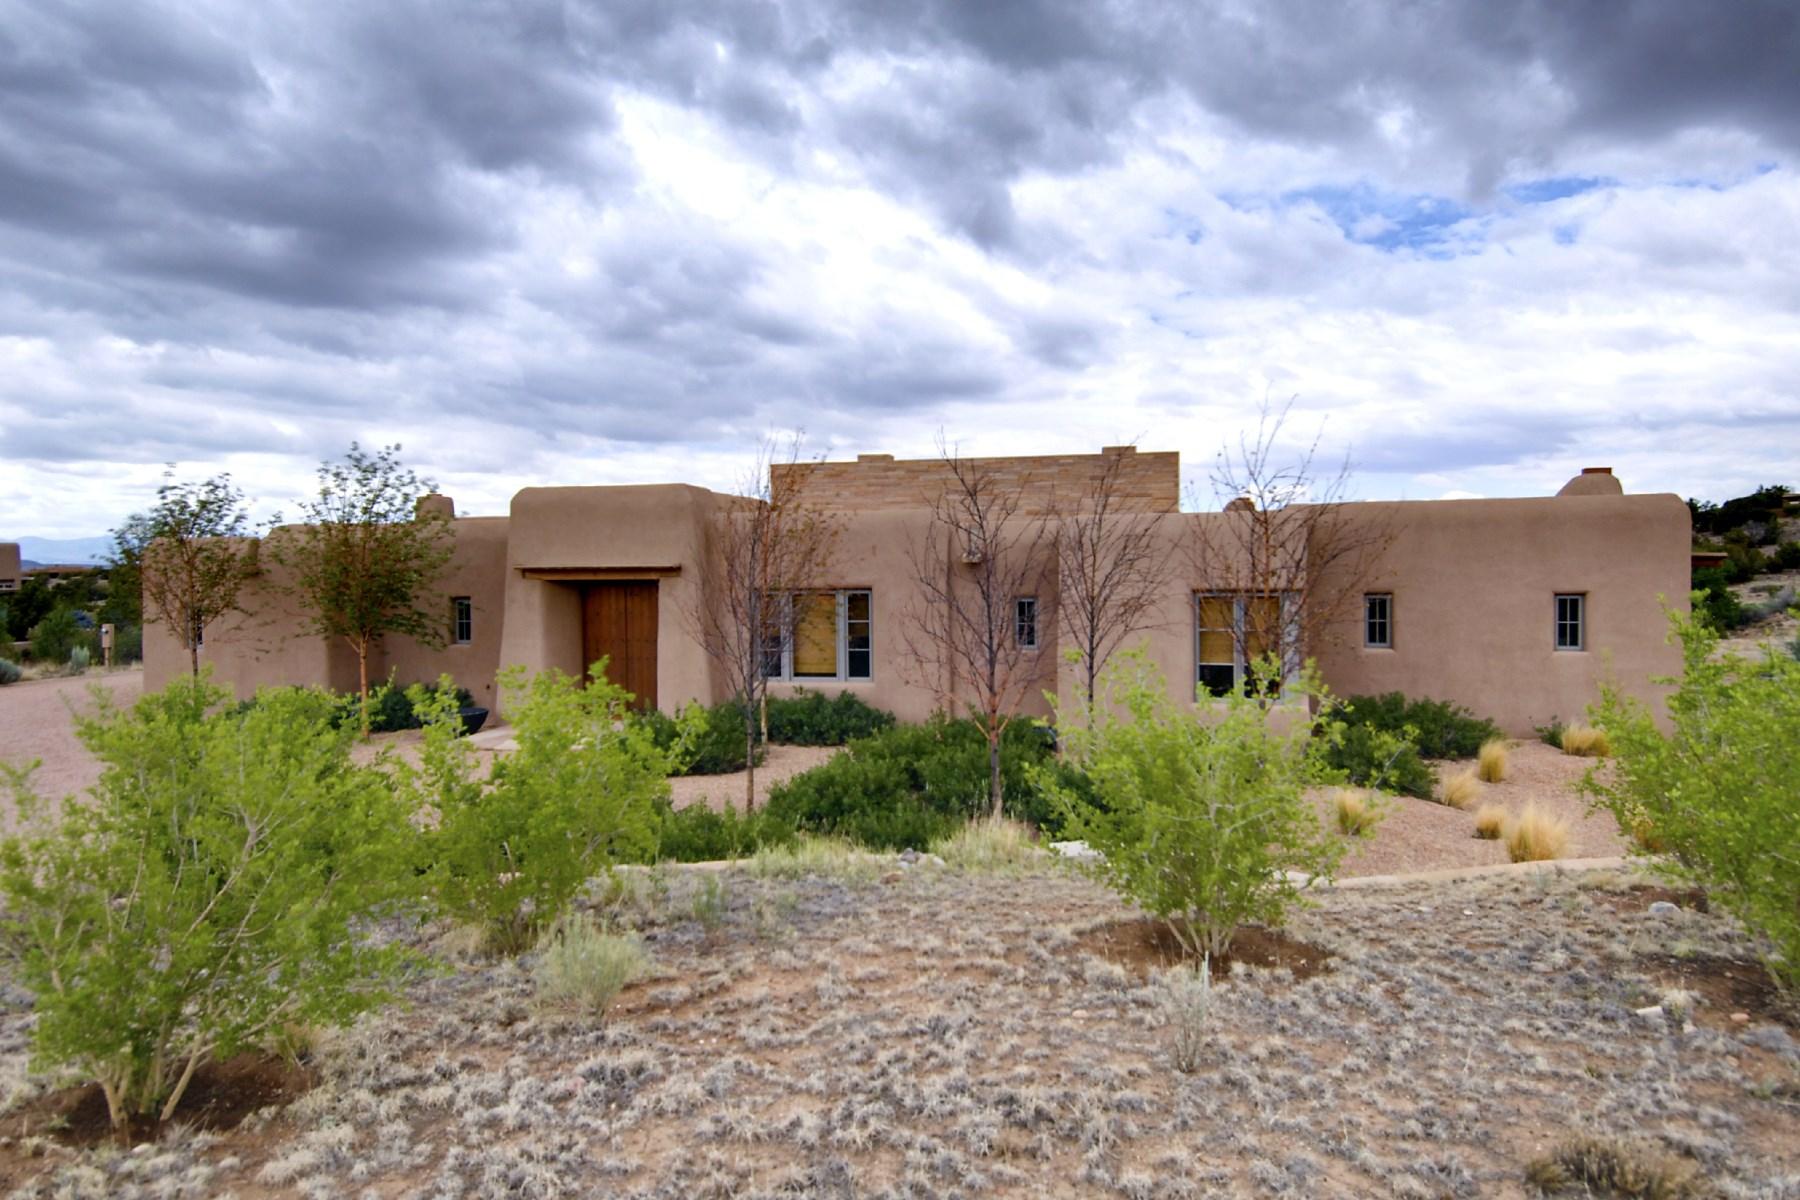 Single Family Home for Sale at 26 Amberwood Loop Las Campanas & Los Santeros, Santa Fe, New Mexico, 87506 United States